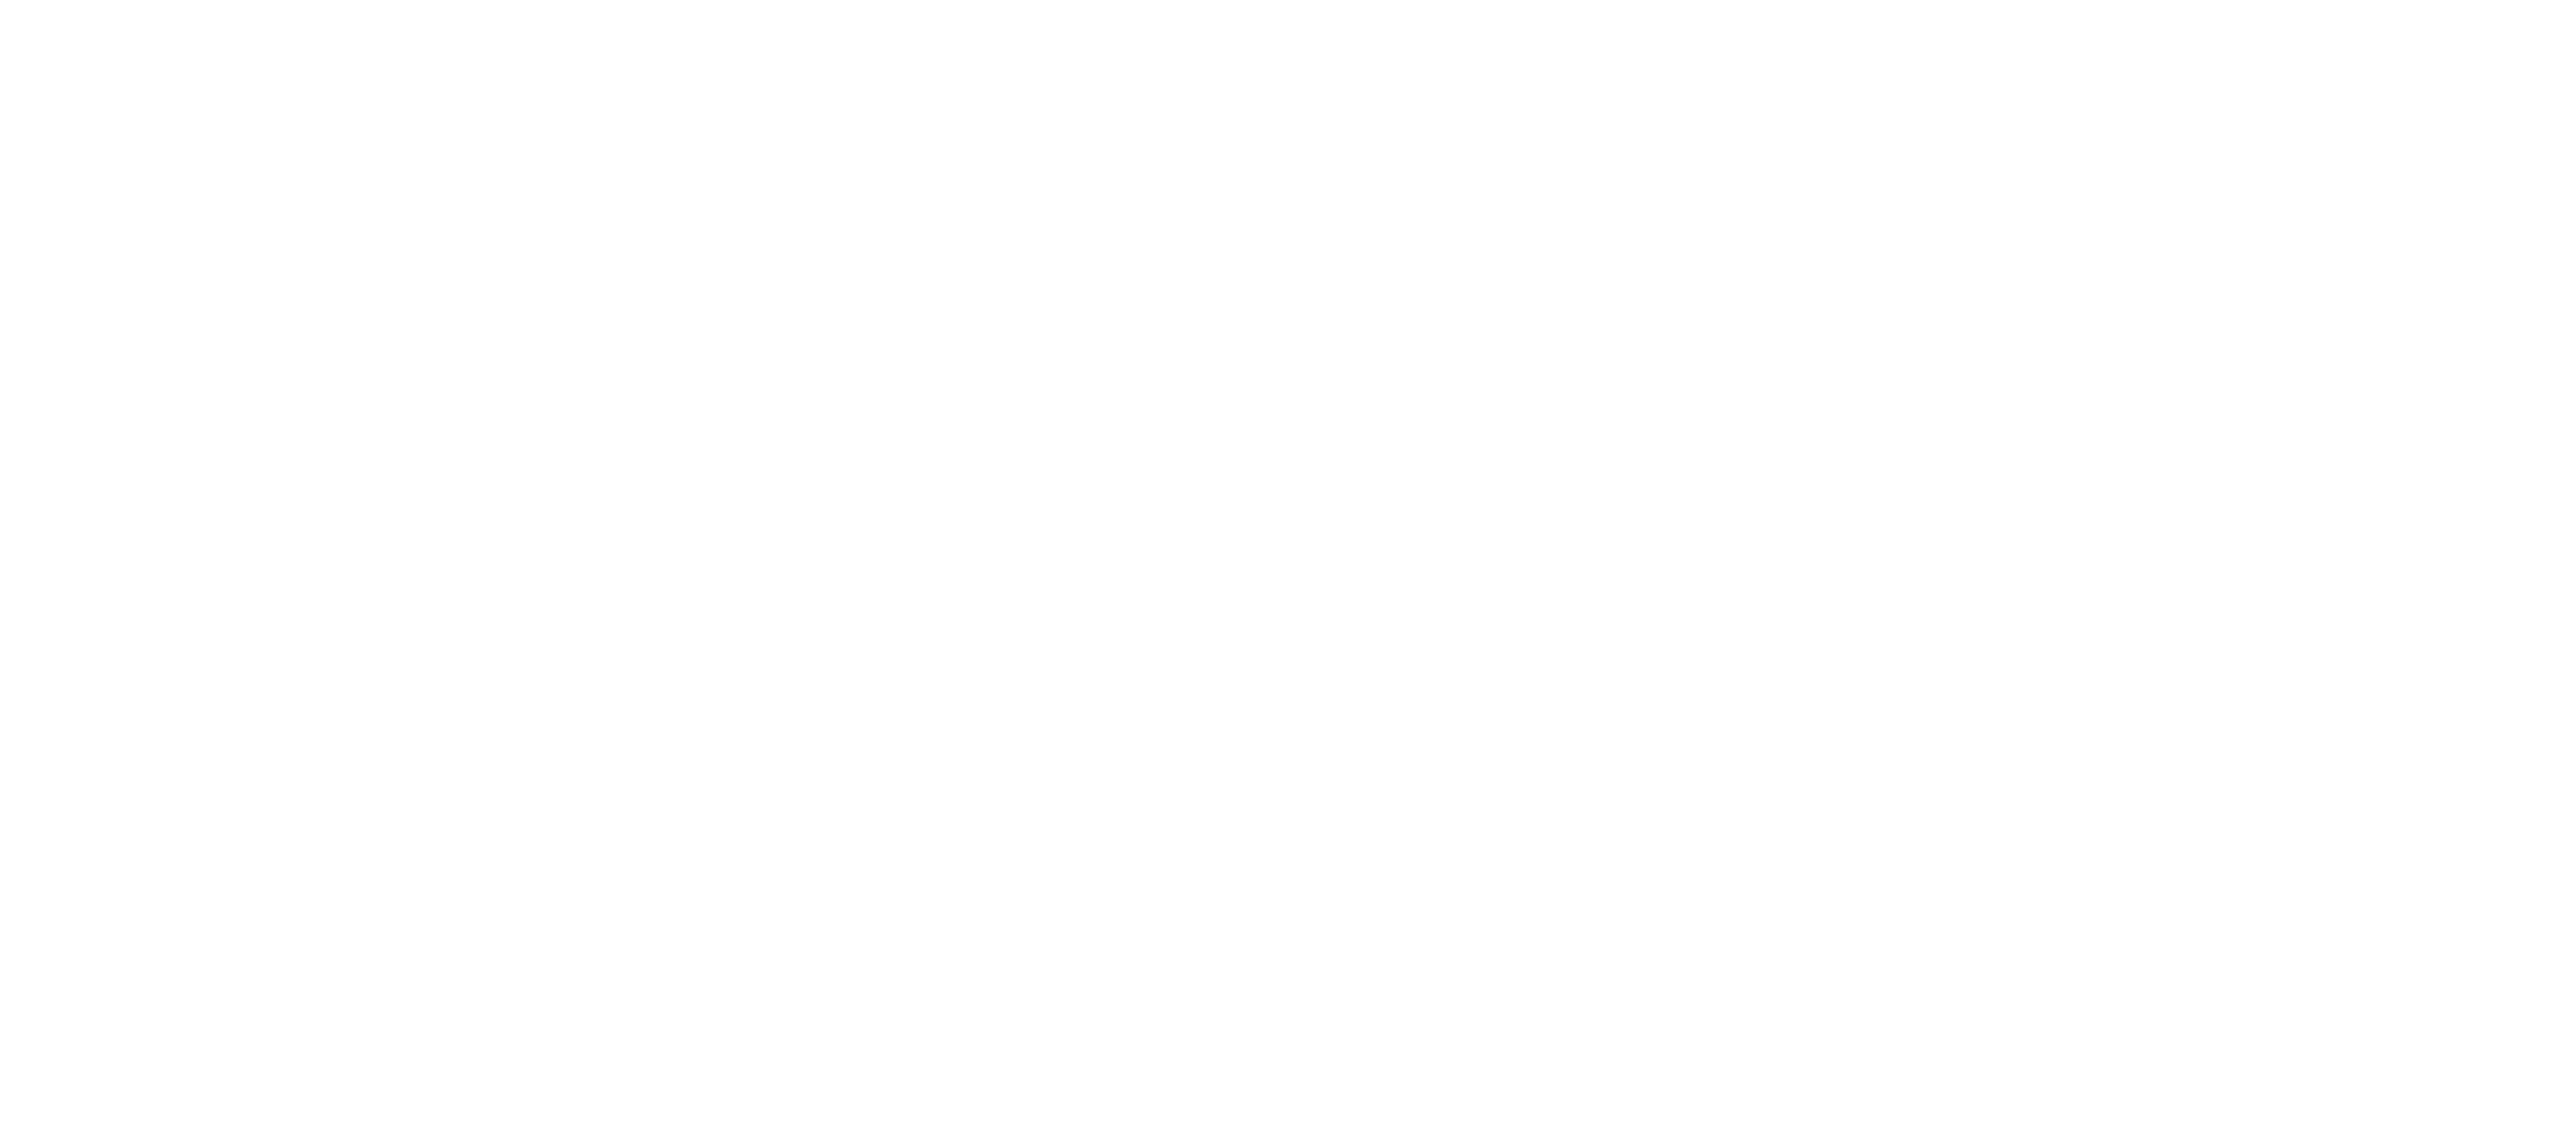 Tiffany Melius